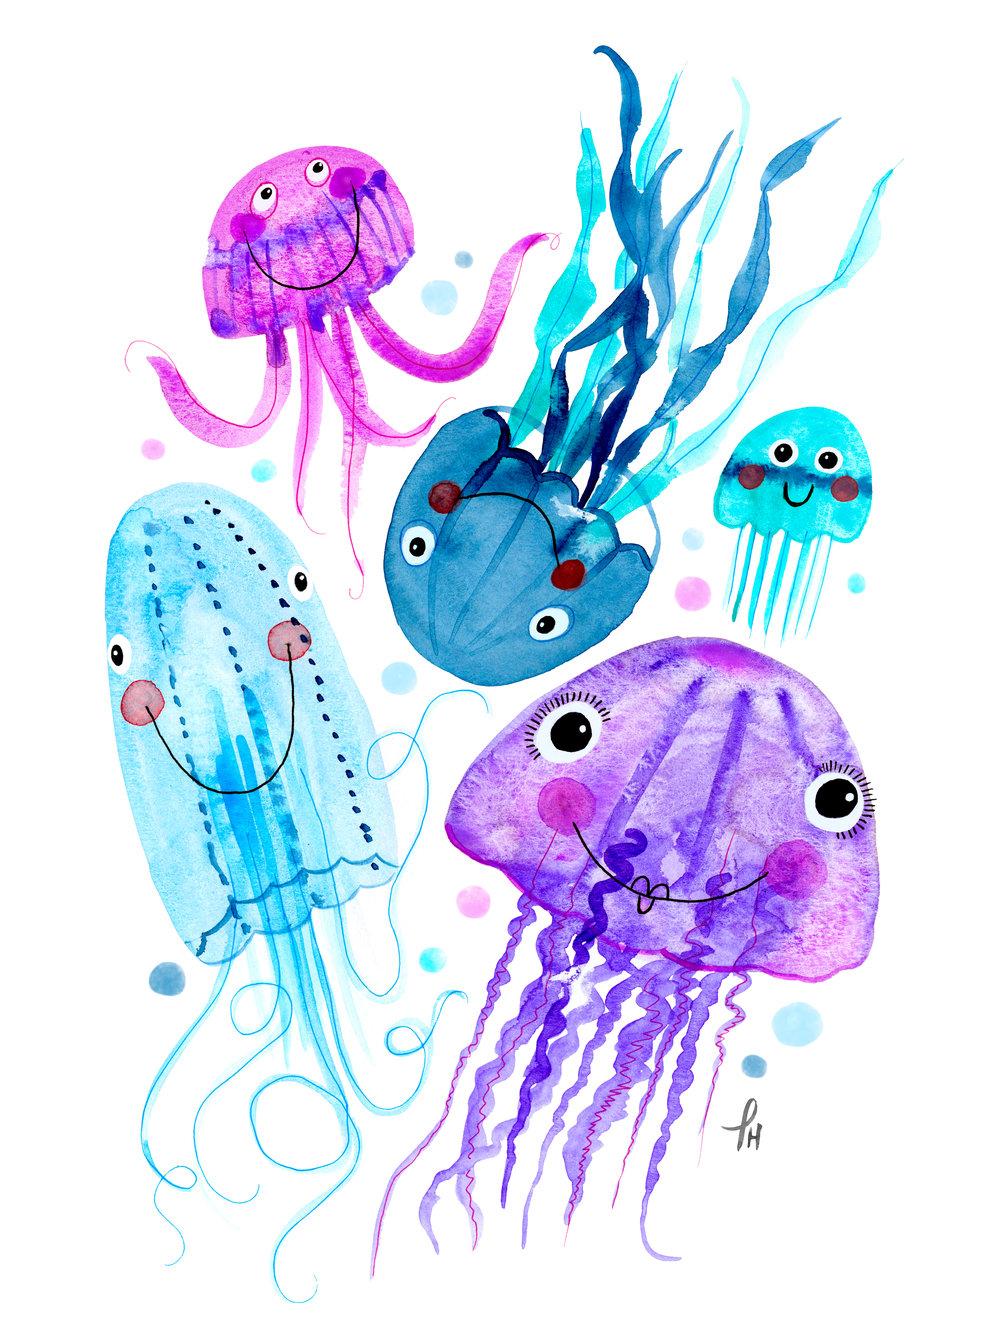 PatriceHorvath_jellyfishS6.jpg